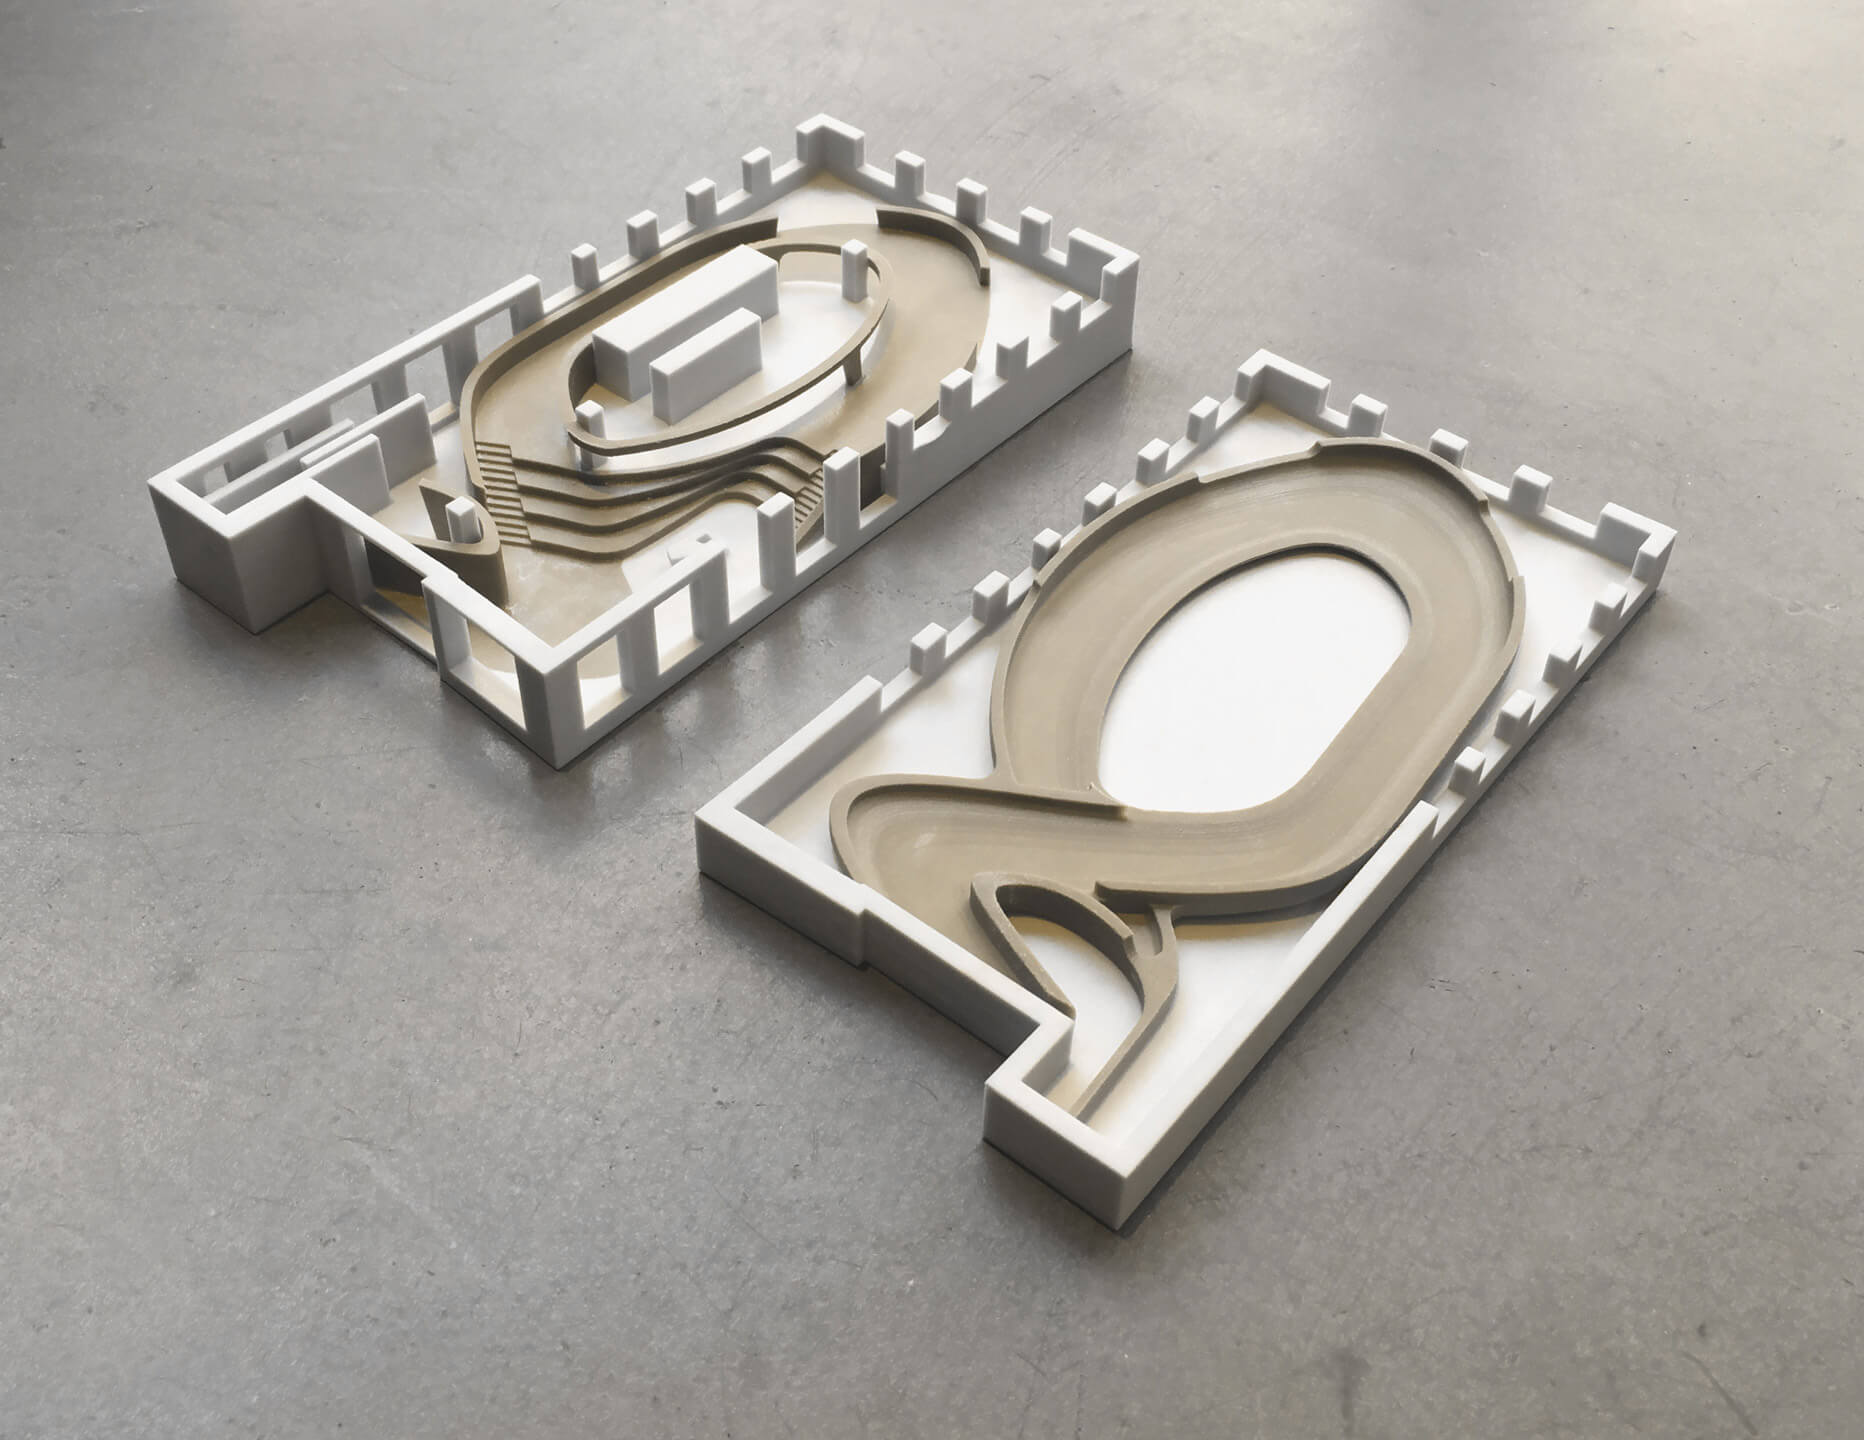 Sculptform Design Studio prototype